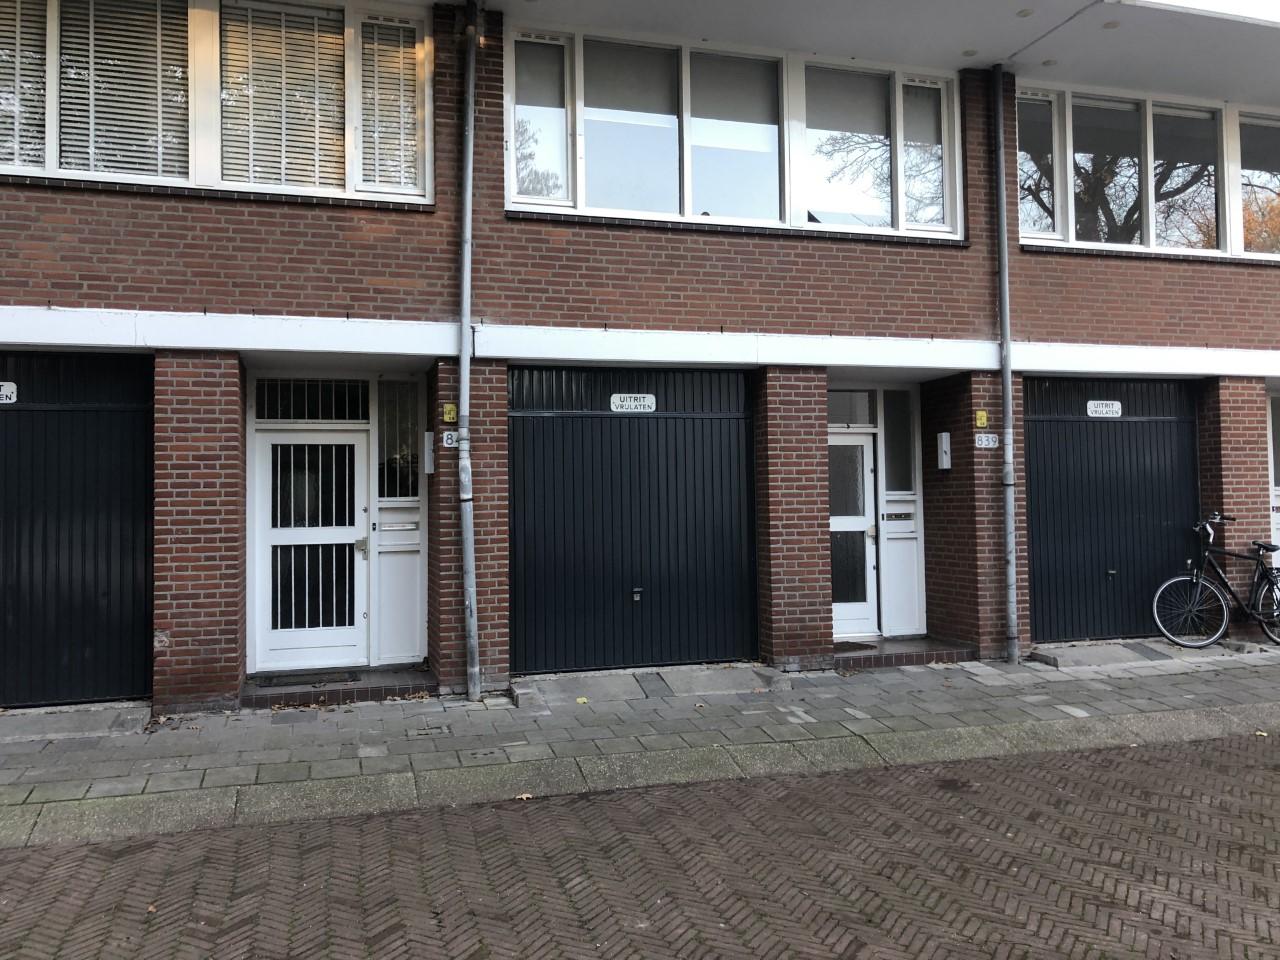 Frederikstraat 839, Den Haag